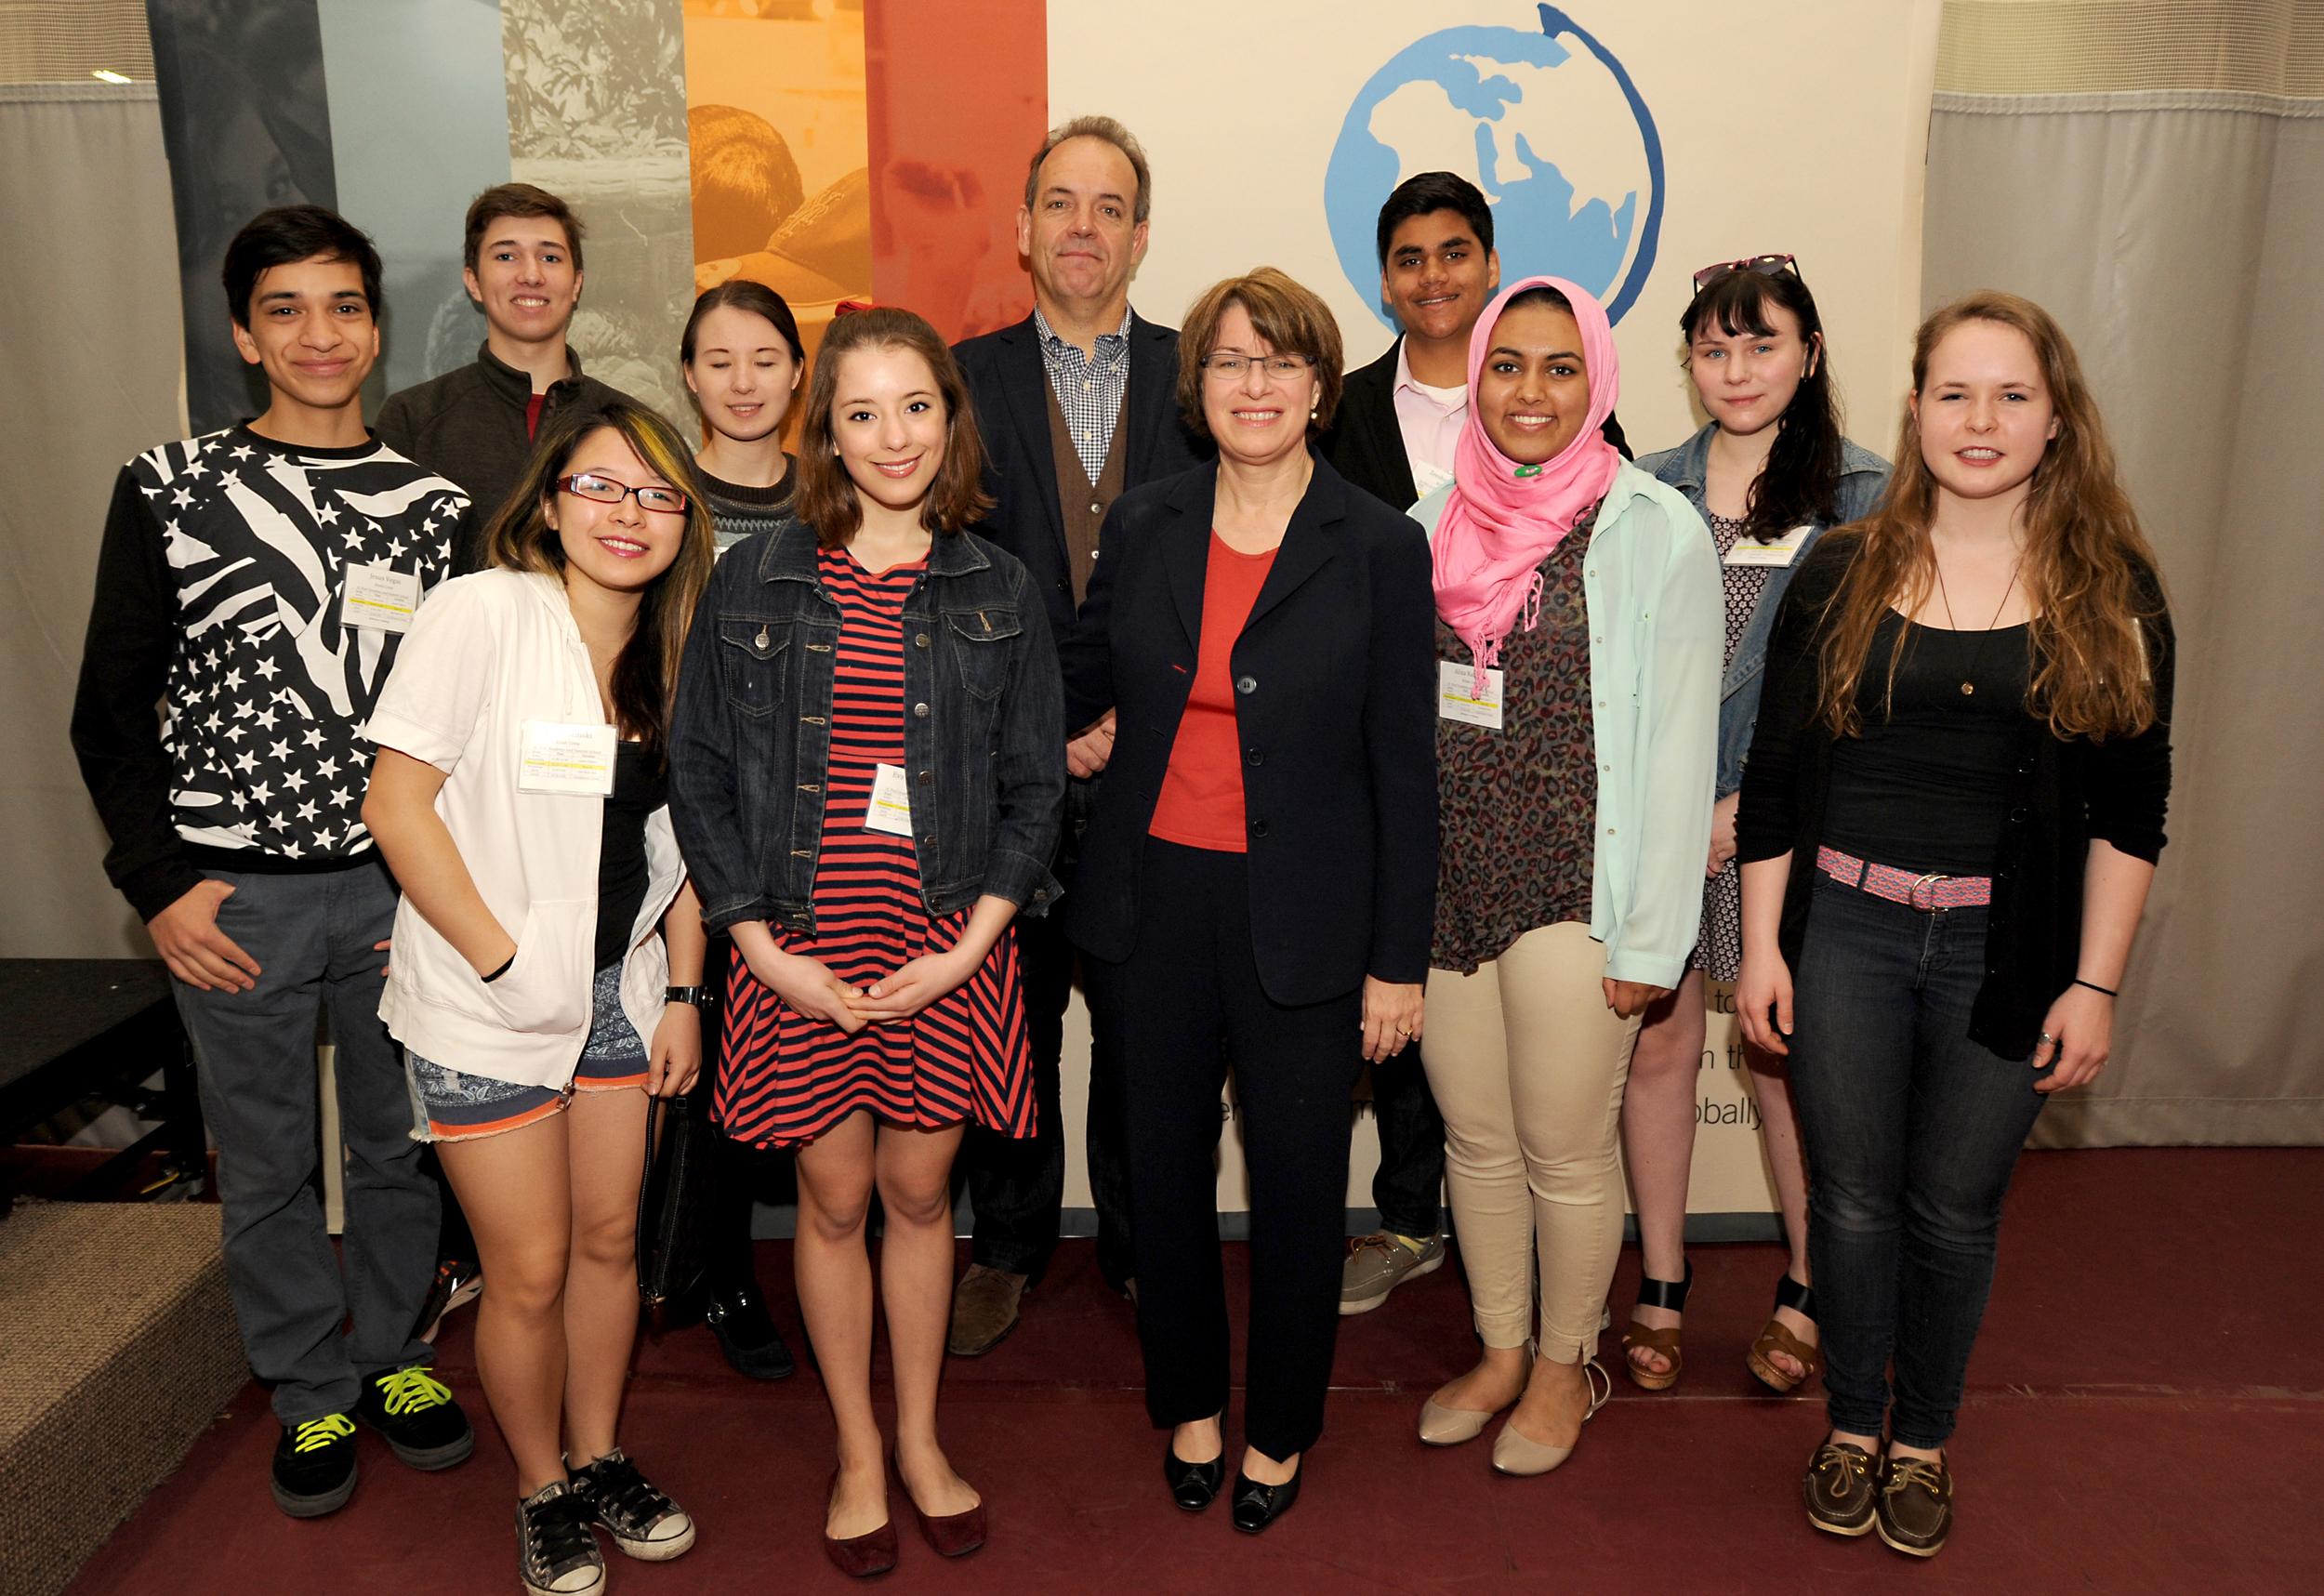 ws_challenge_Sen. Klobuchar with St. Paul Academy students.jpg